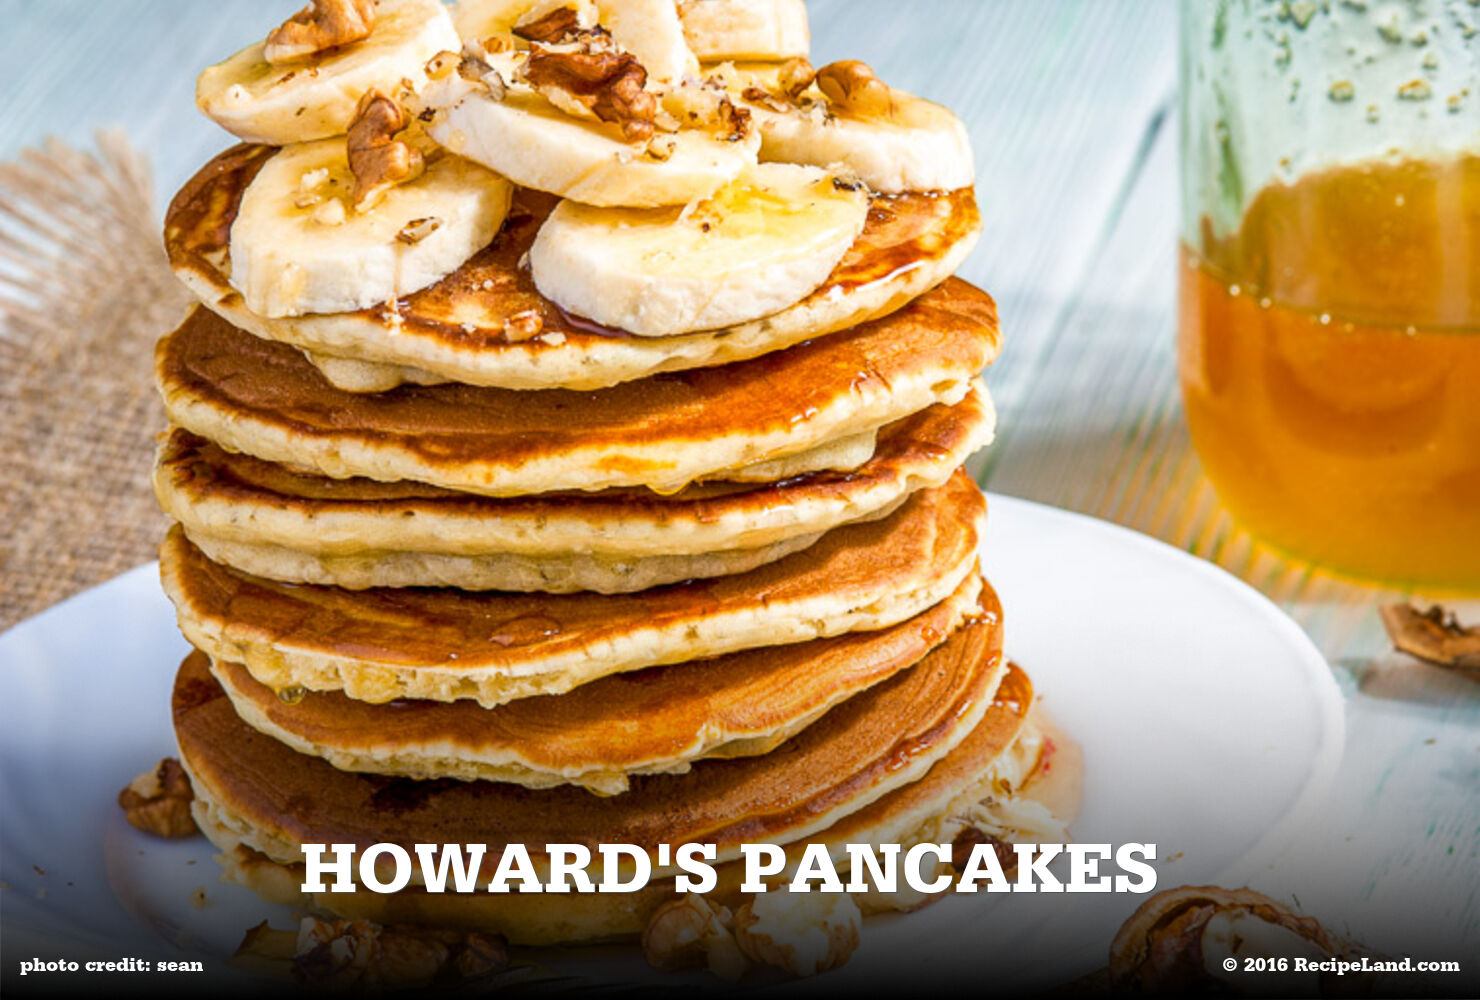 Howard's Pancakes